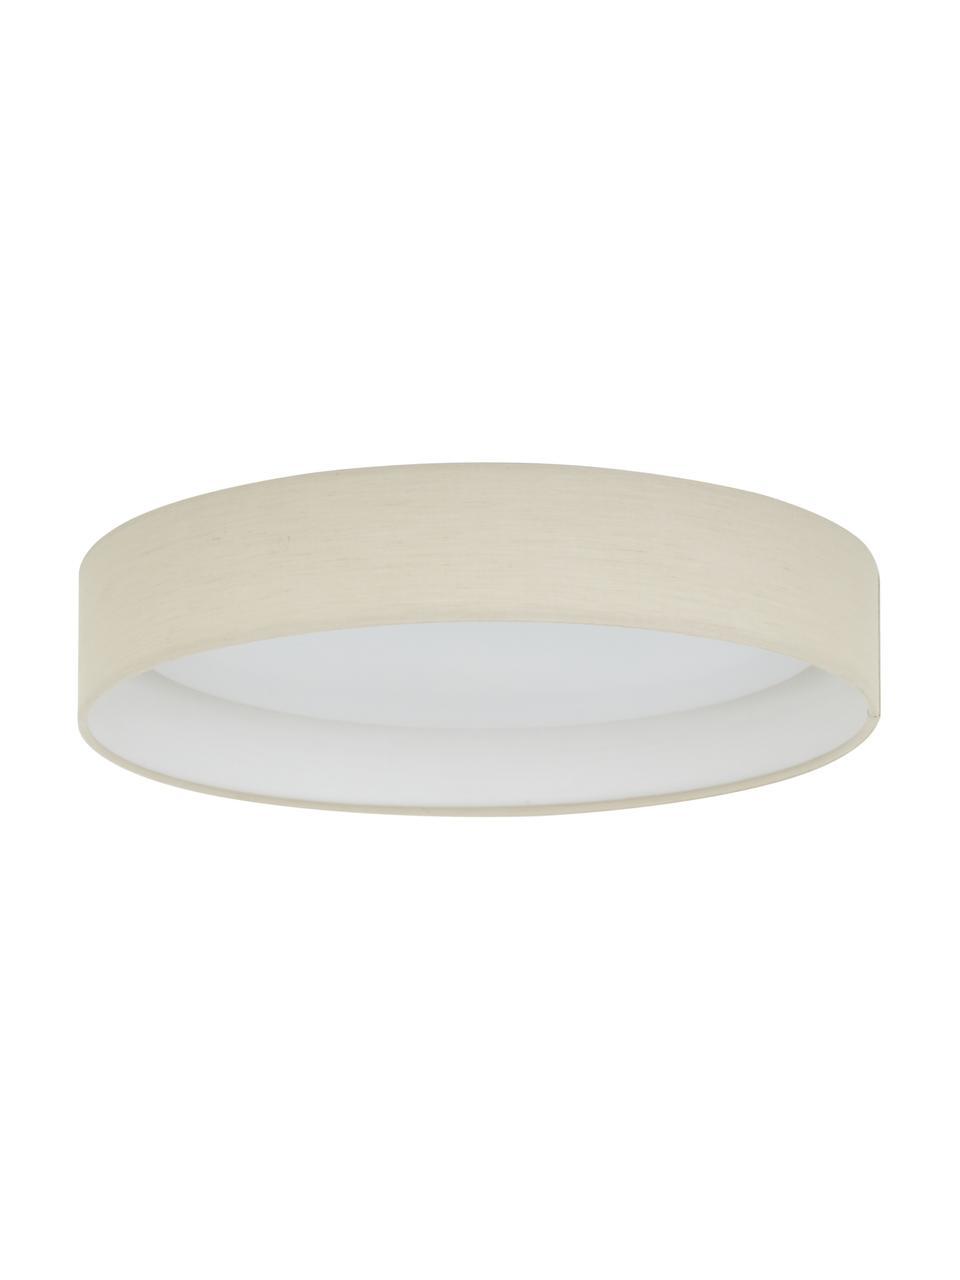 Lampa sufitowa LED Helen, Taupe, Ø 52 x W 11 cm